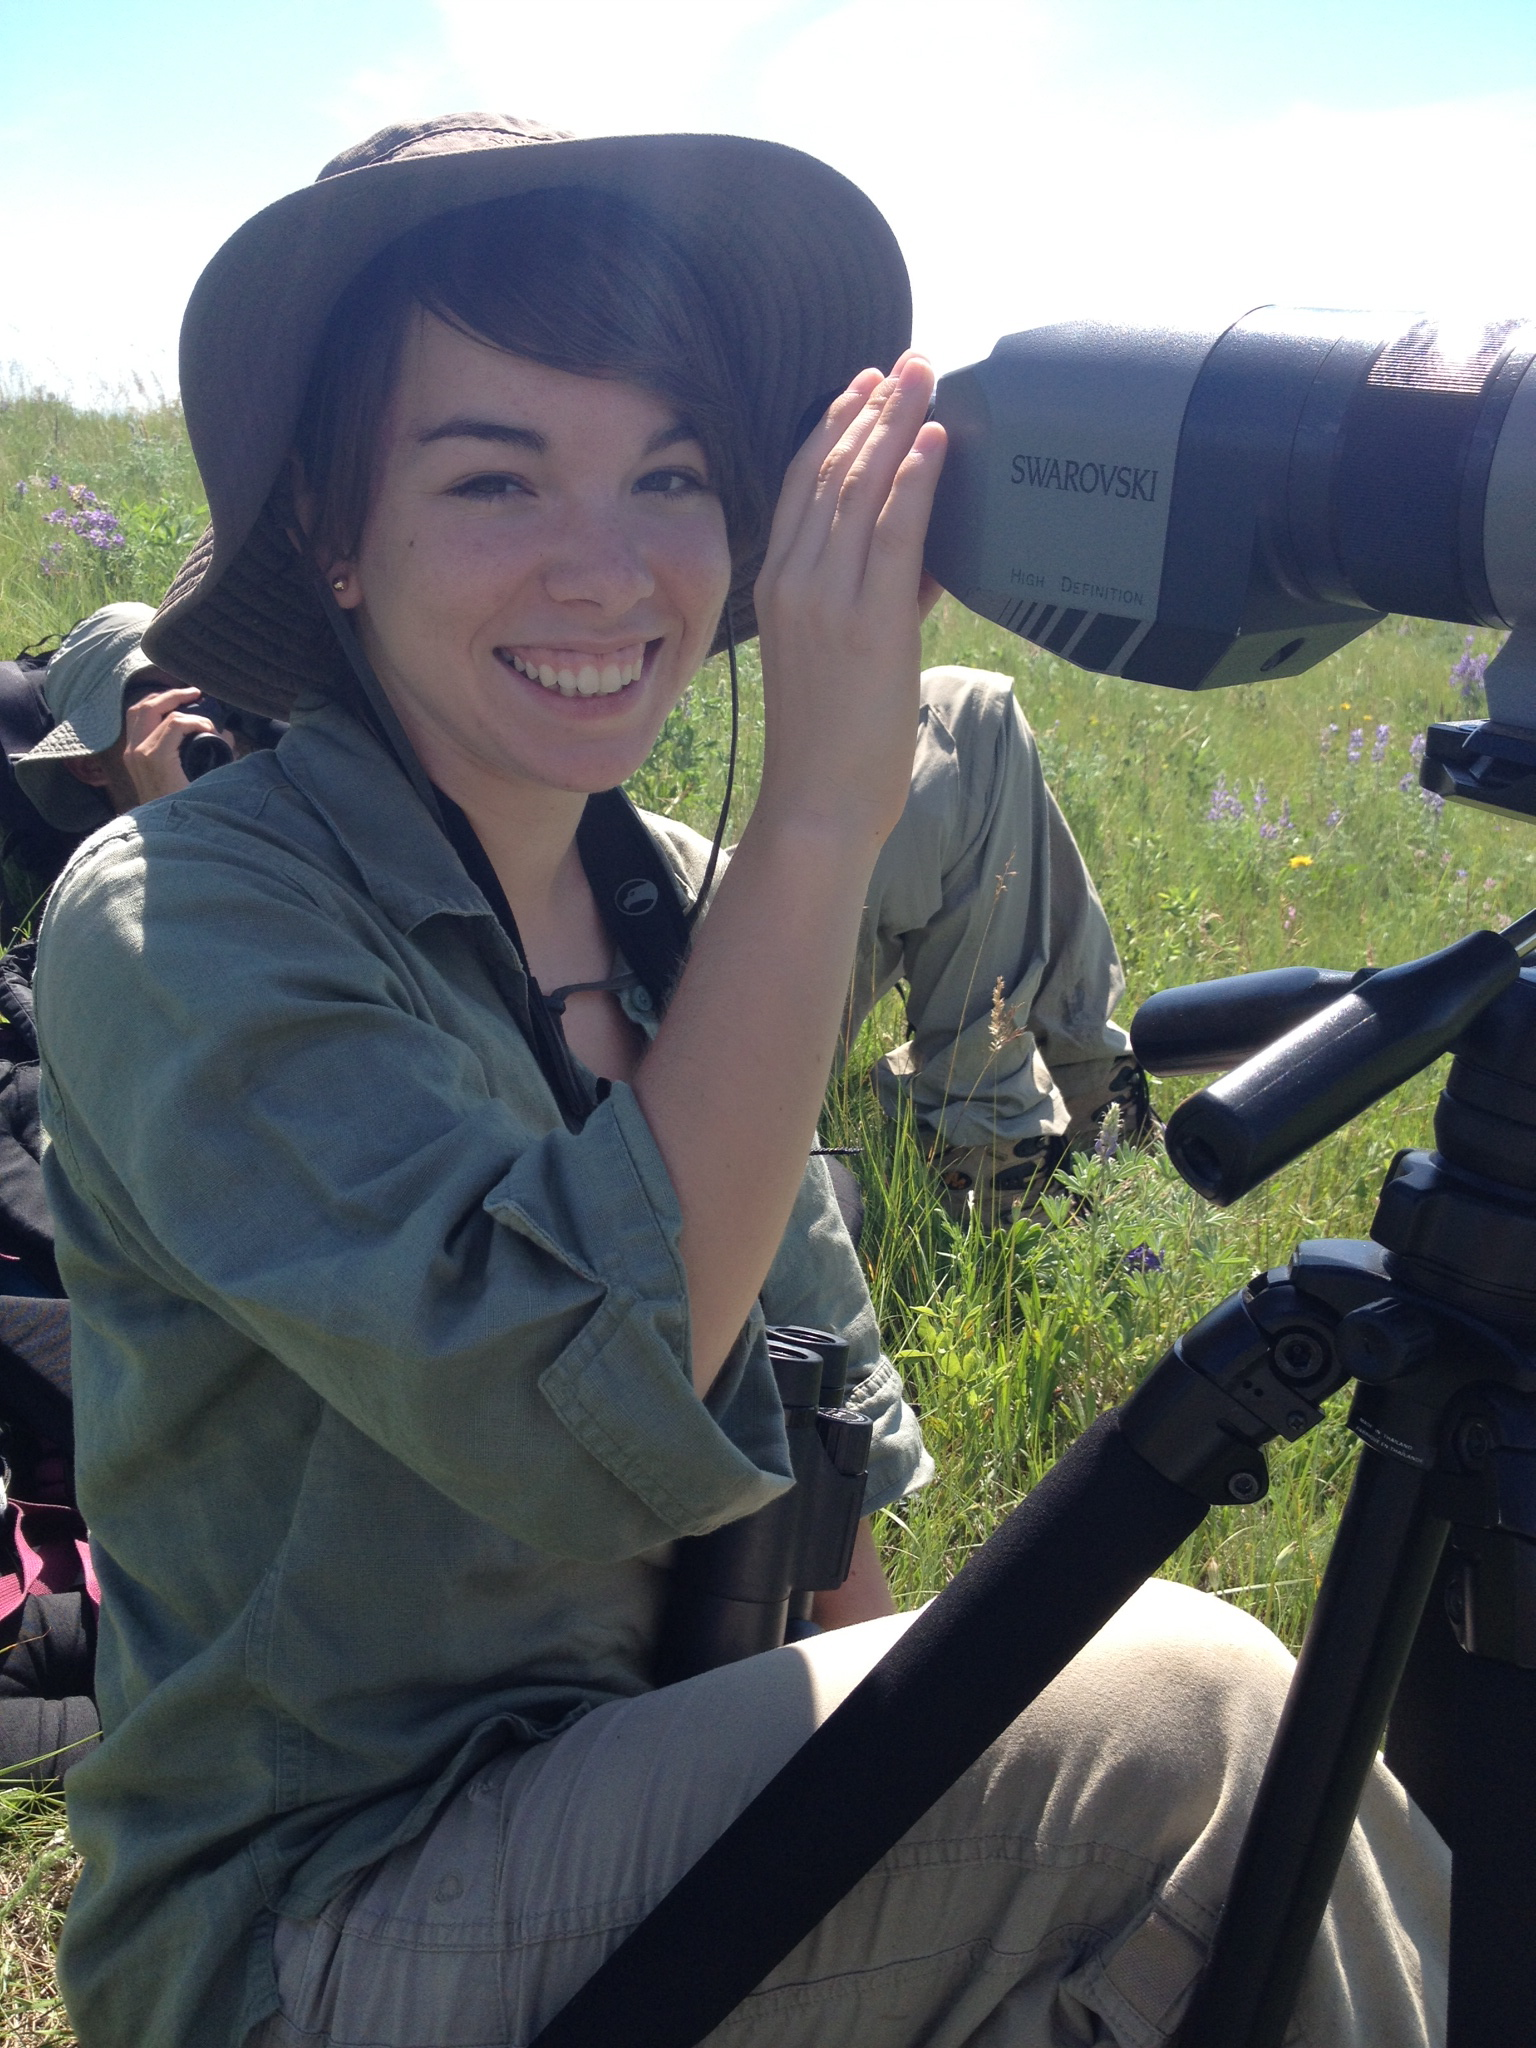 Maegwin Bonar | BSc (Winnipeg) | MSc (Memorial University of Newfoundland)